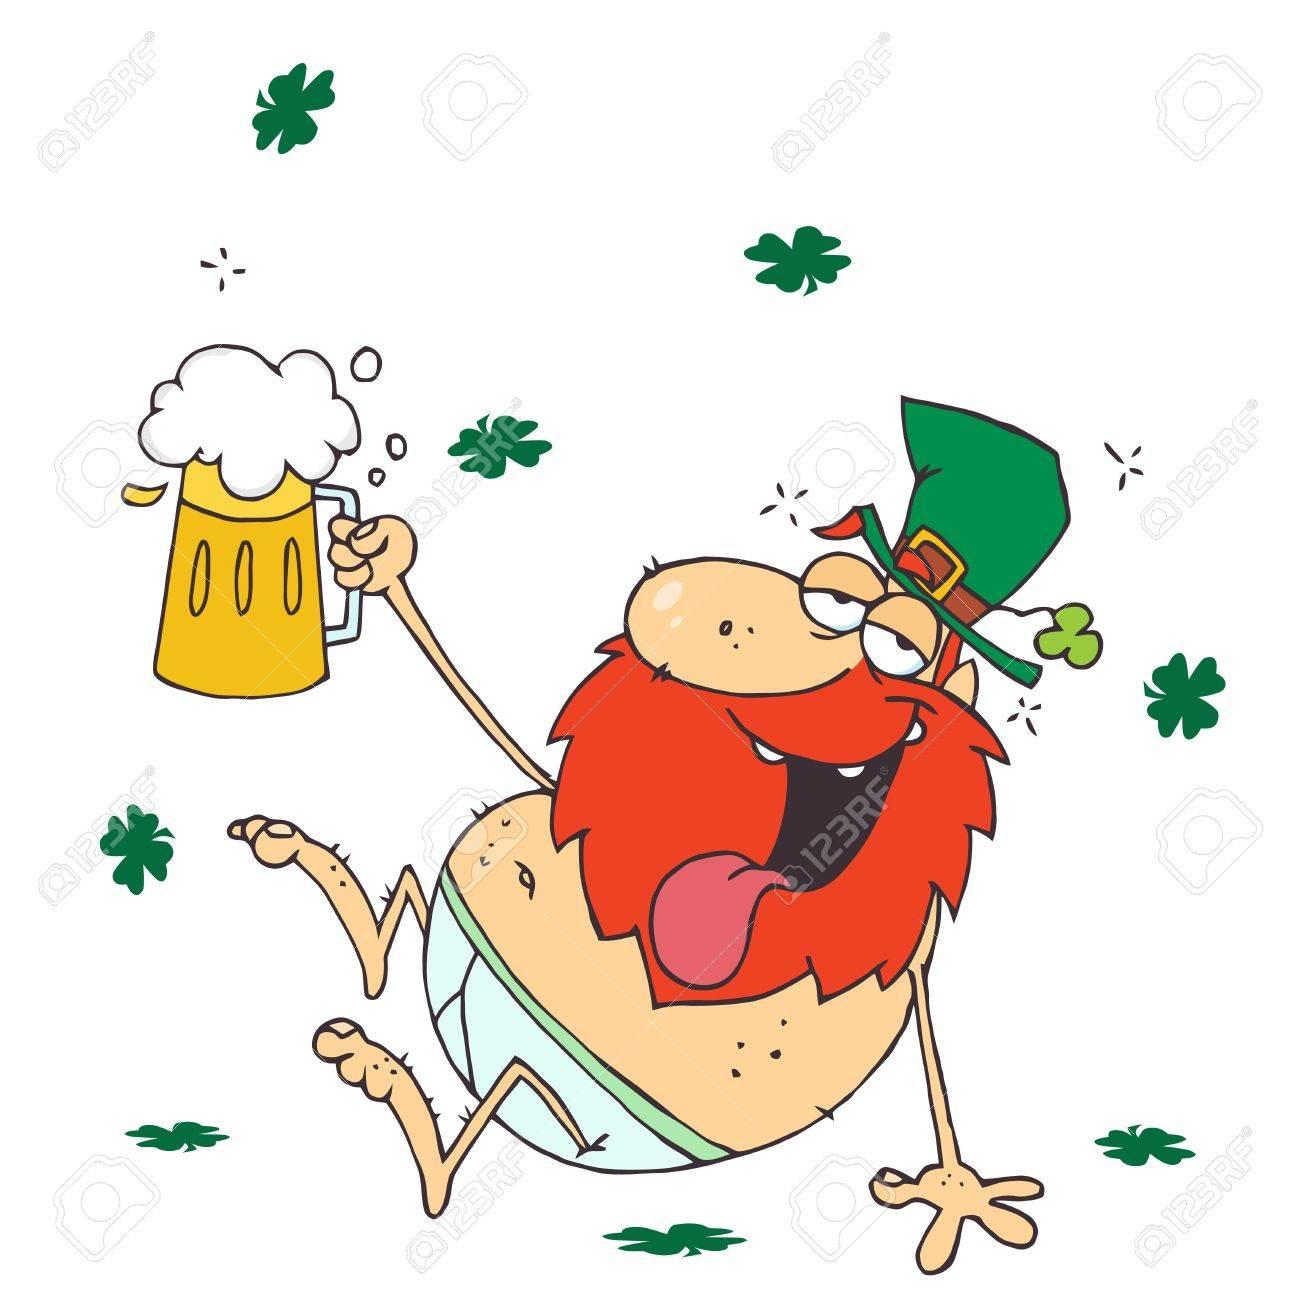 Drunk Leprechaun Lying Naked With Beer Stock Vector - 6906347